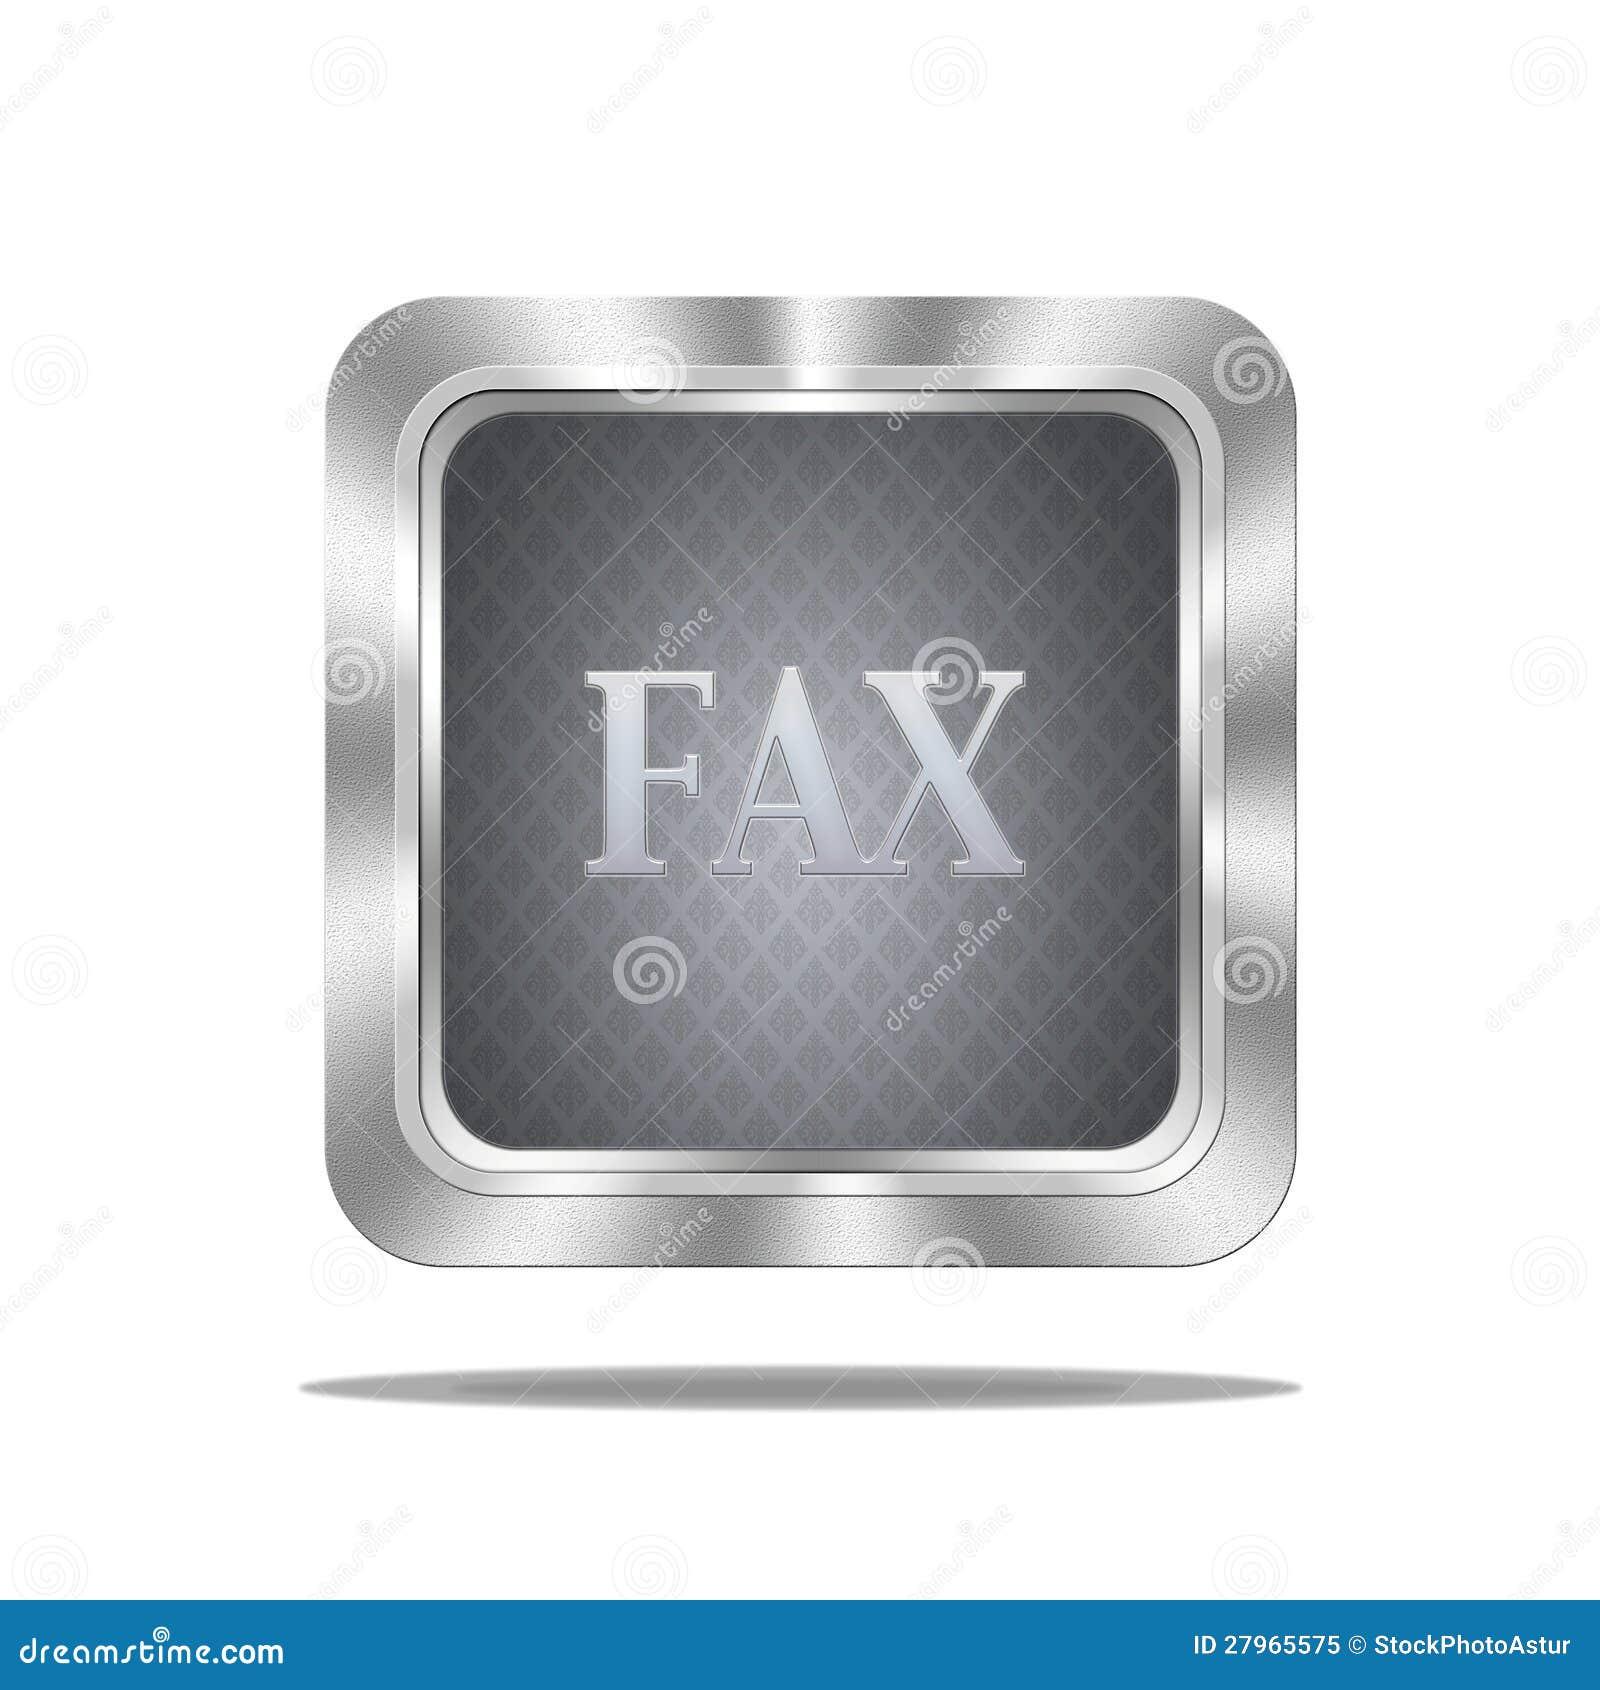 Fax button.